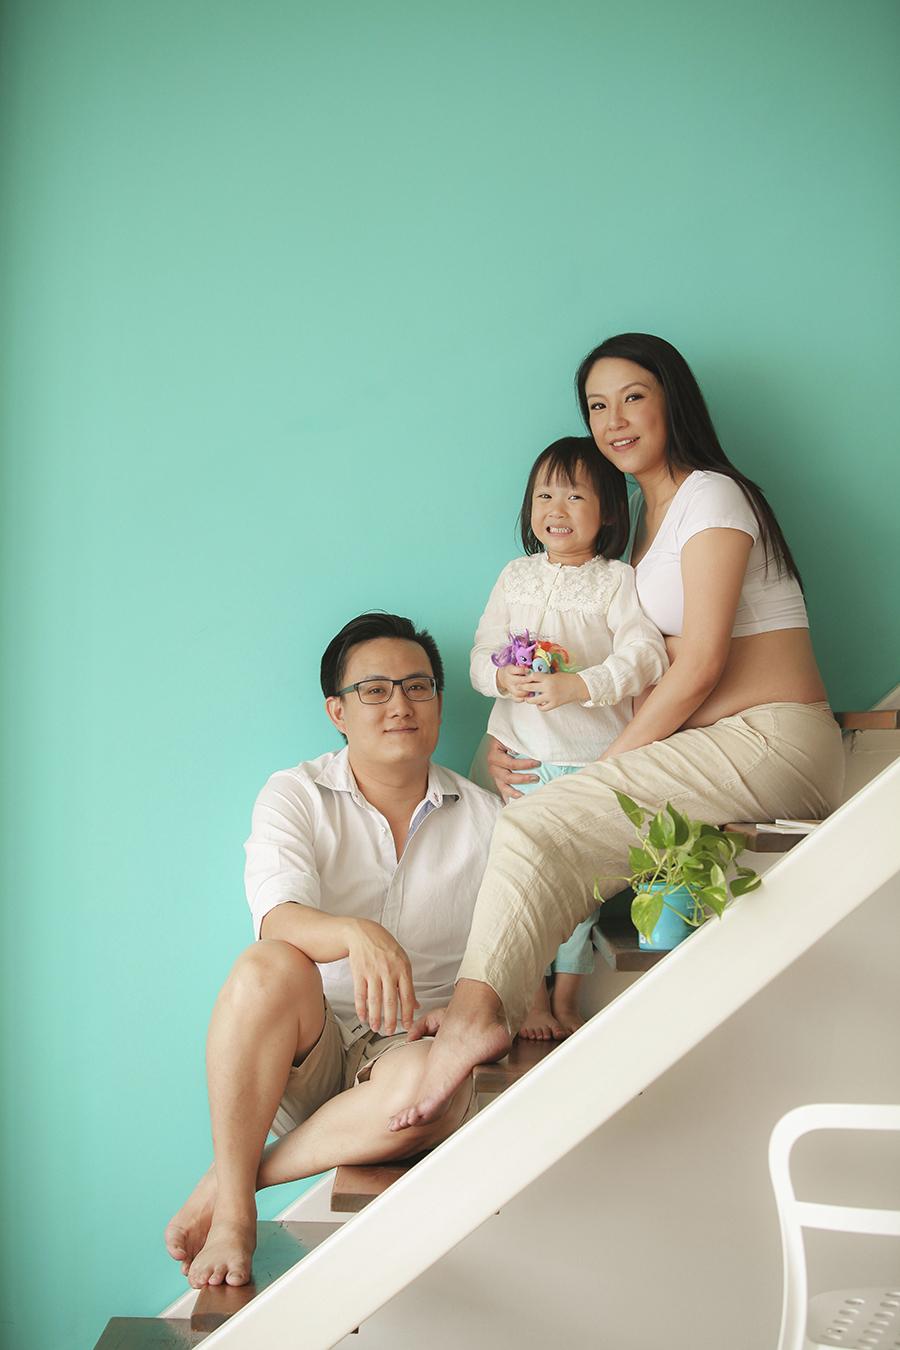 maternity + family portrait photography by kurt ahs . 9142.jpg